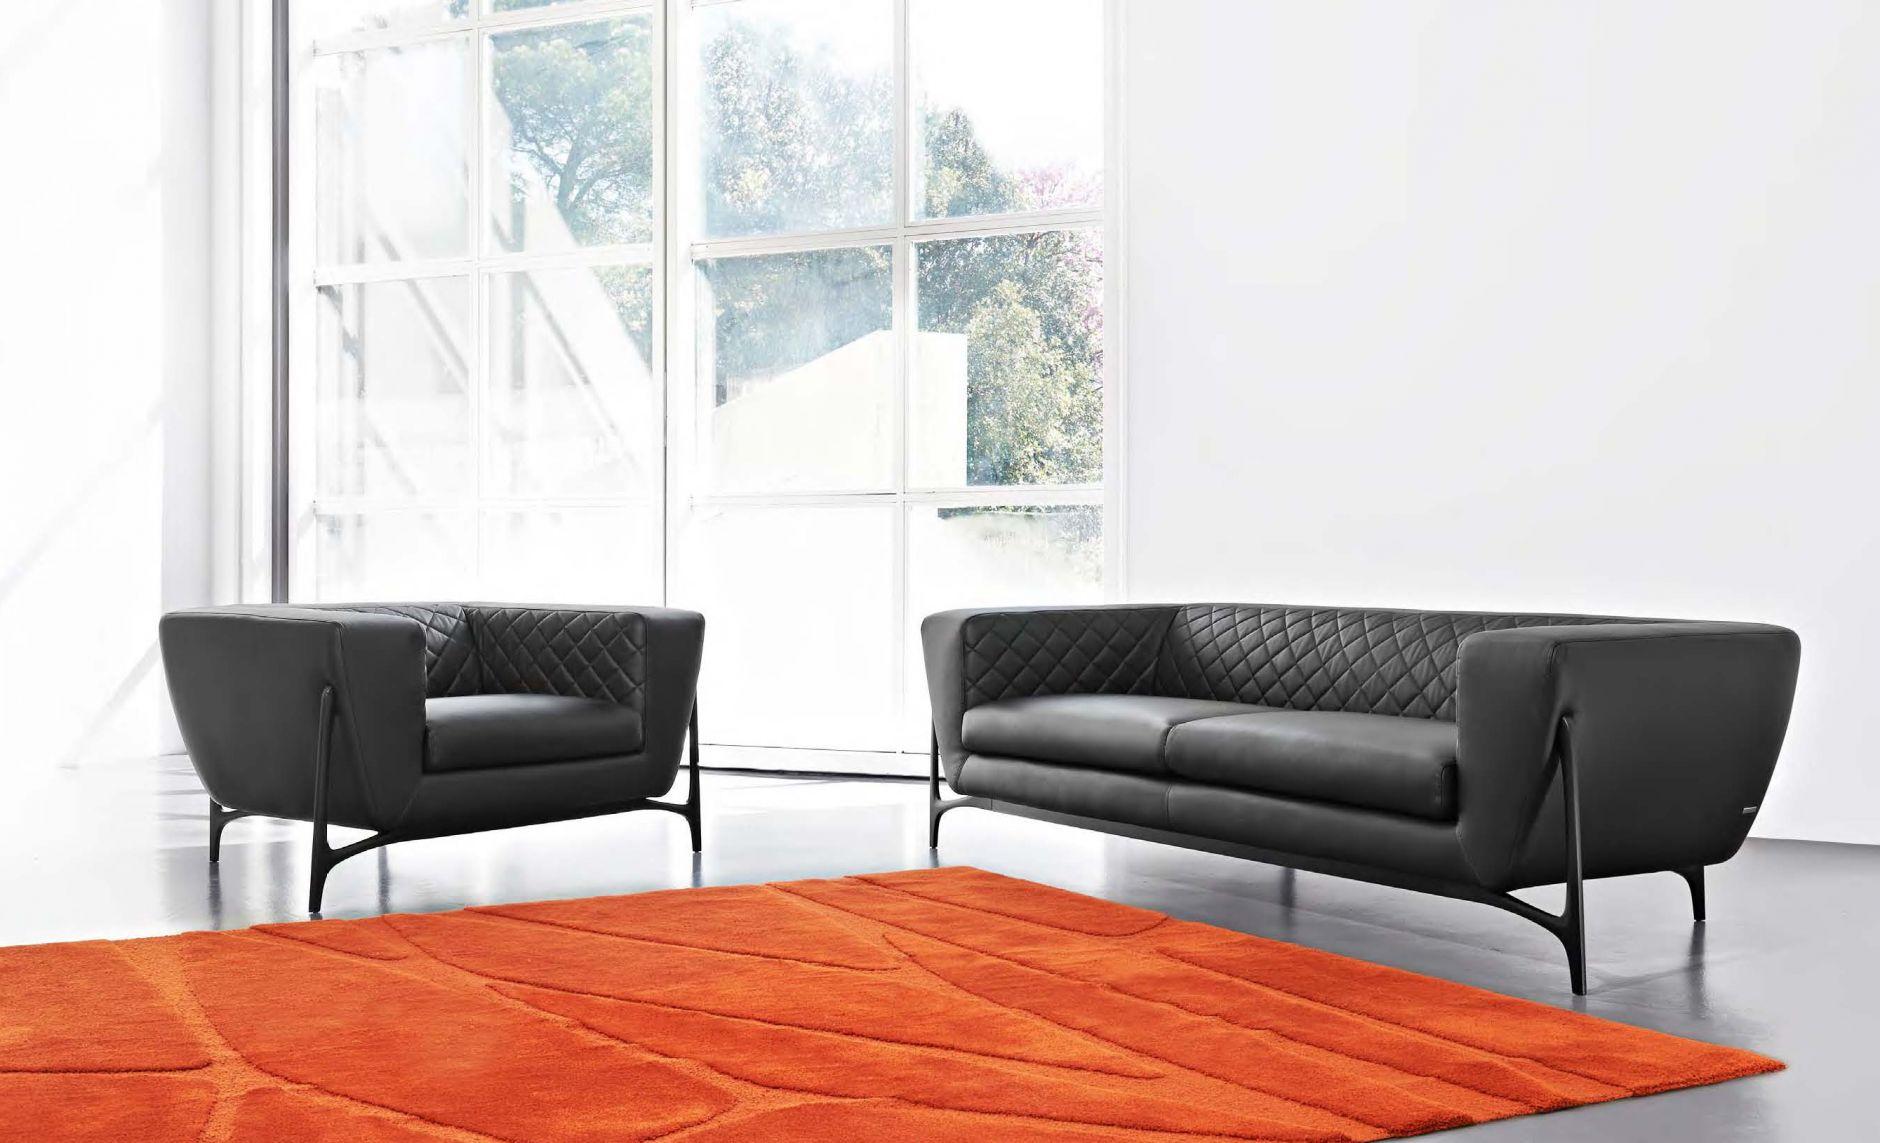 vip sofas luxuri se sofas mercedes benz style 035die. Black Bedroom Furniture Sets. Home Design Ideas